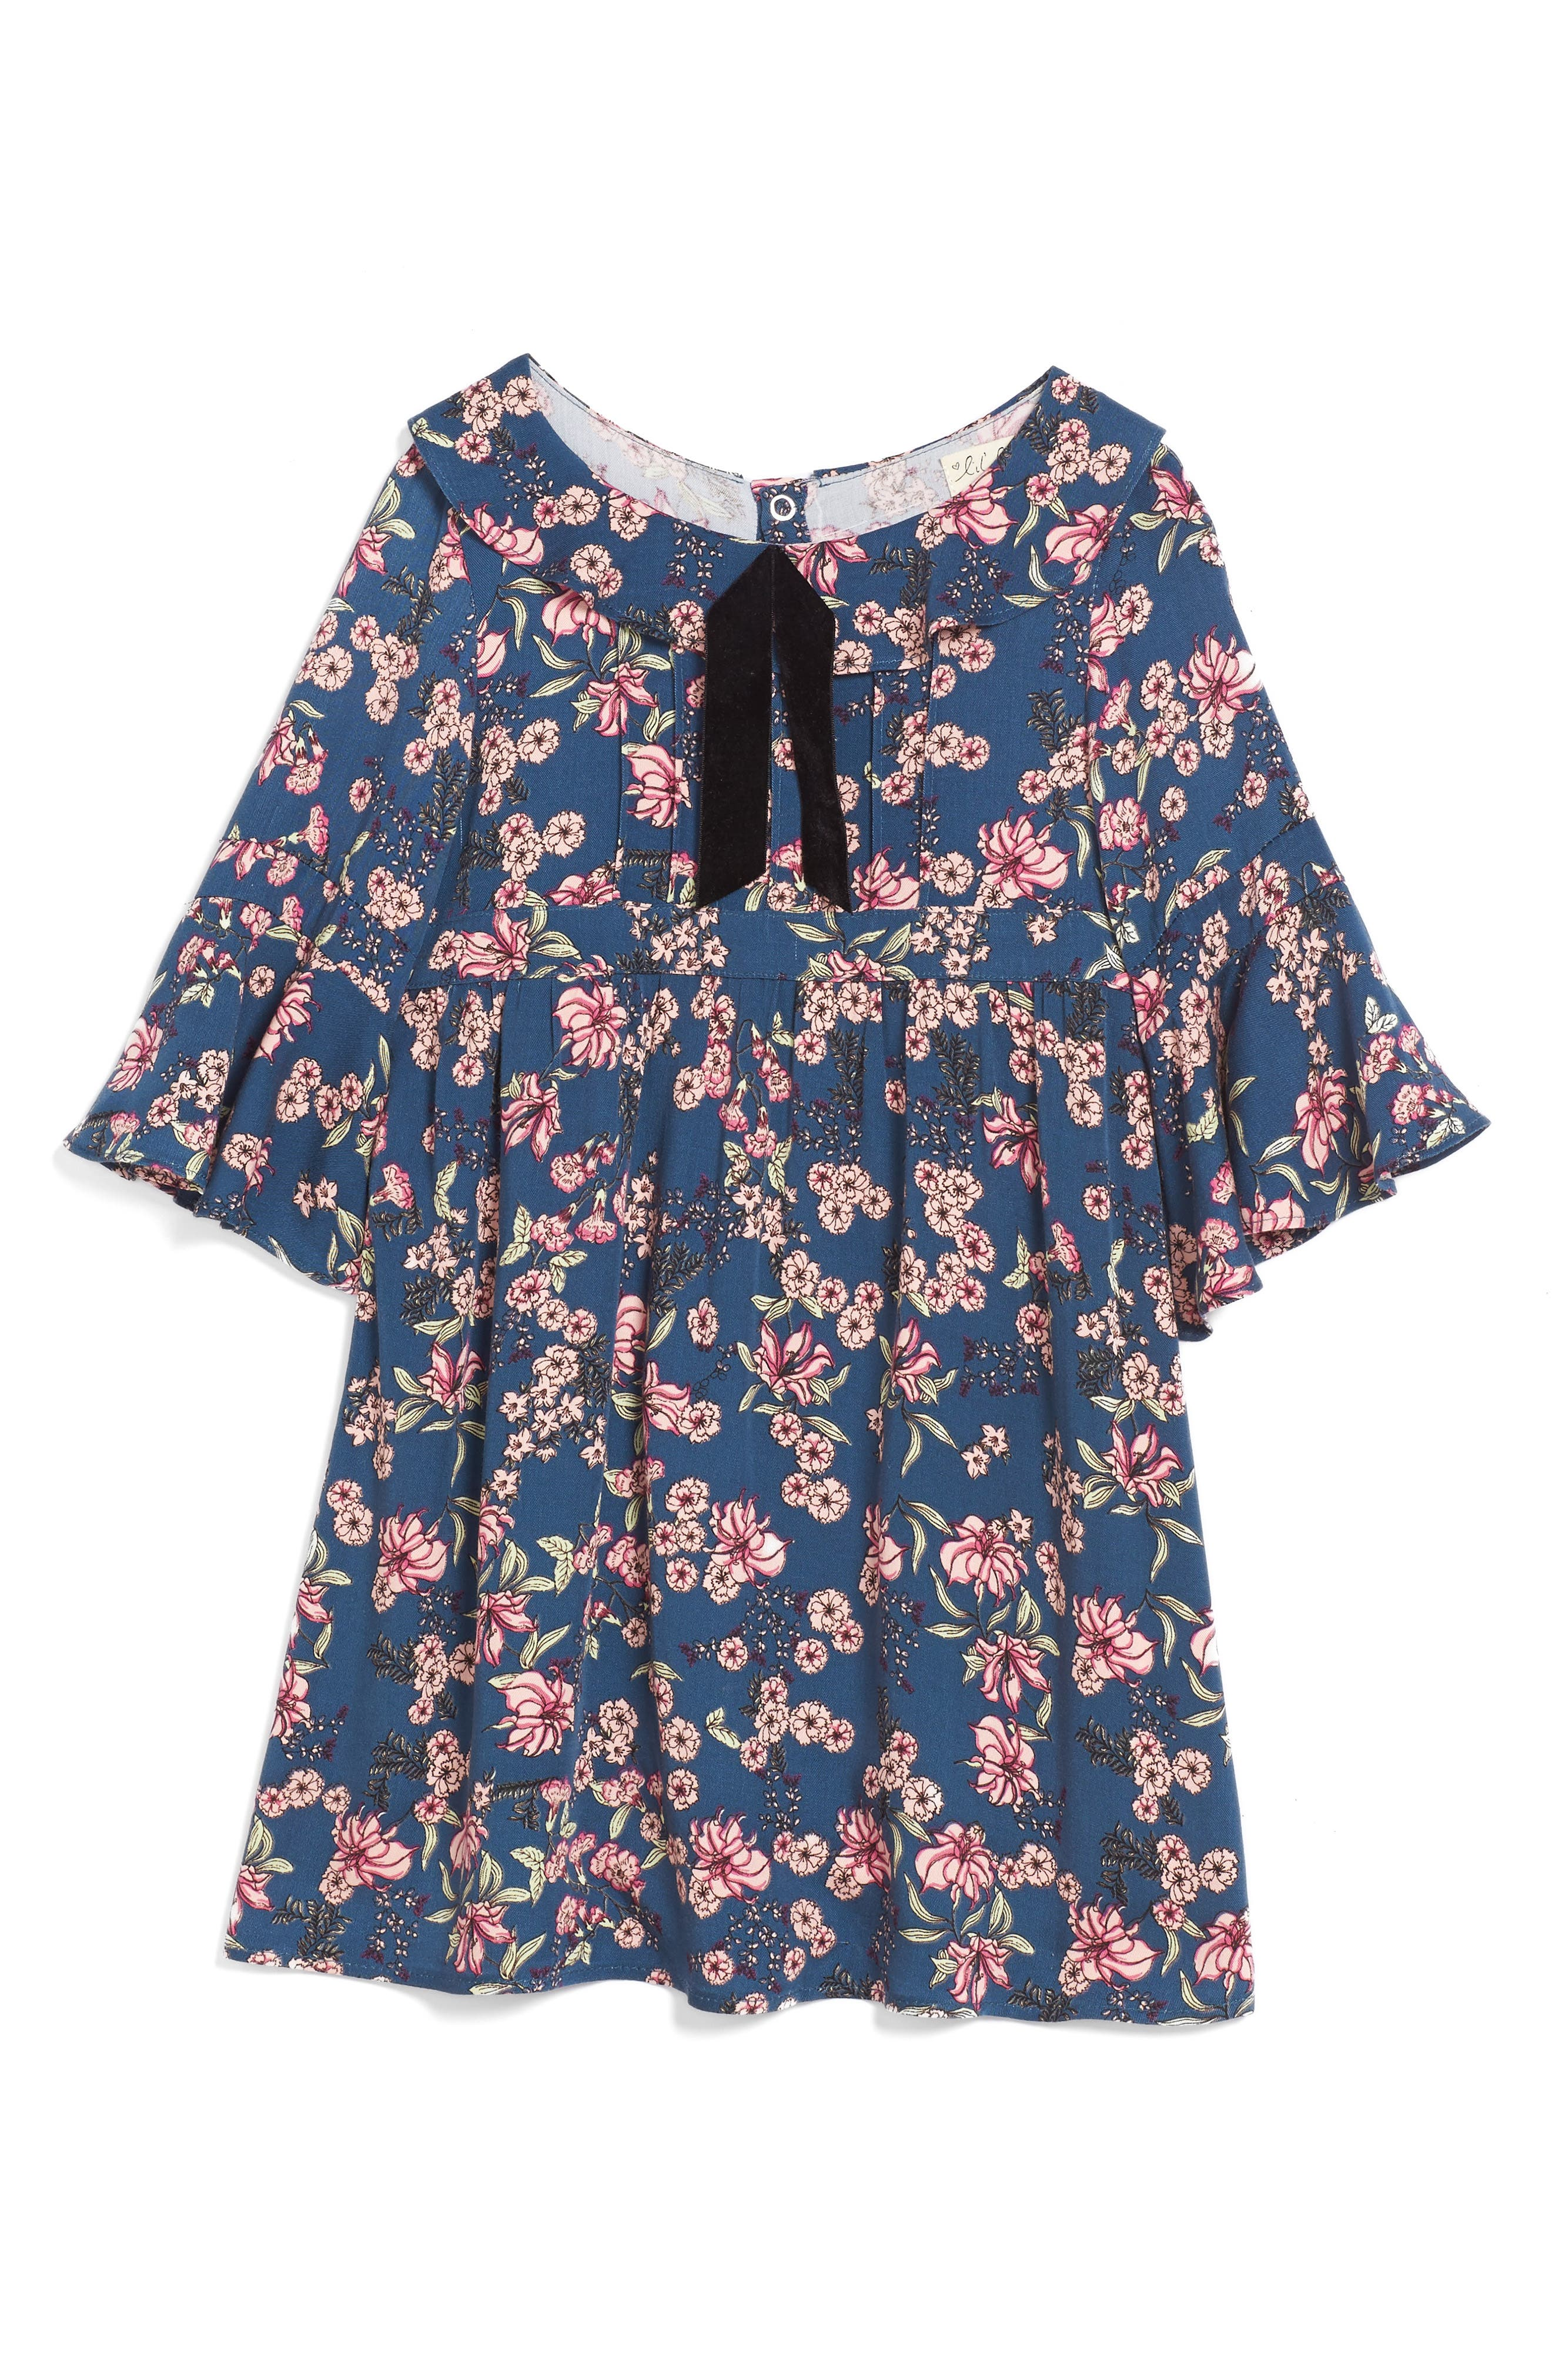 For Love & Lemons Juniper Floral Bell Sleeve Dress,                         Main,                         color, Midnight Floral